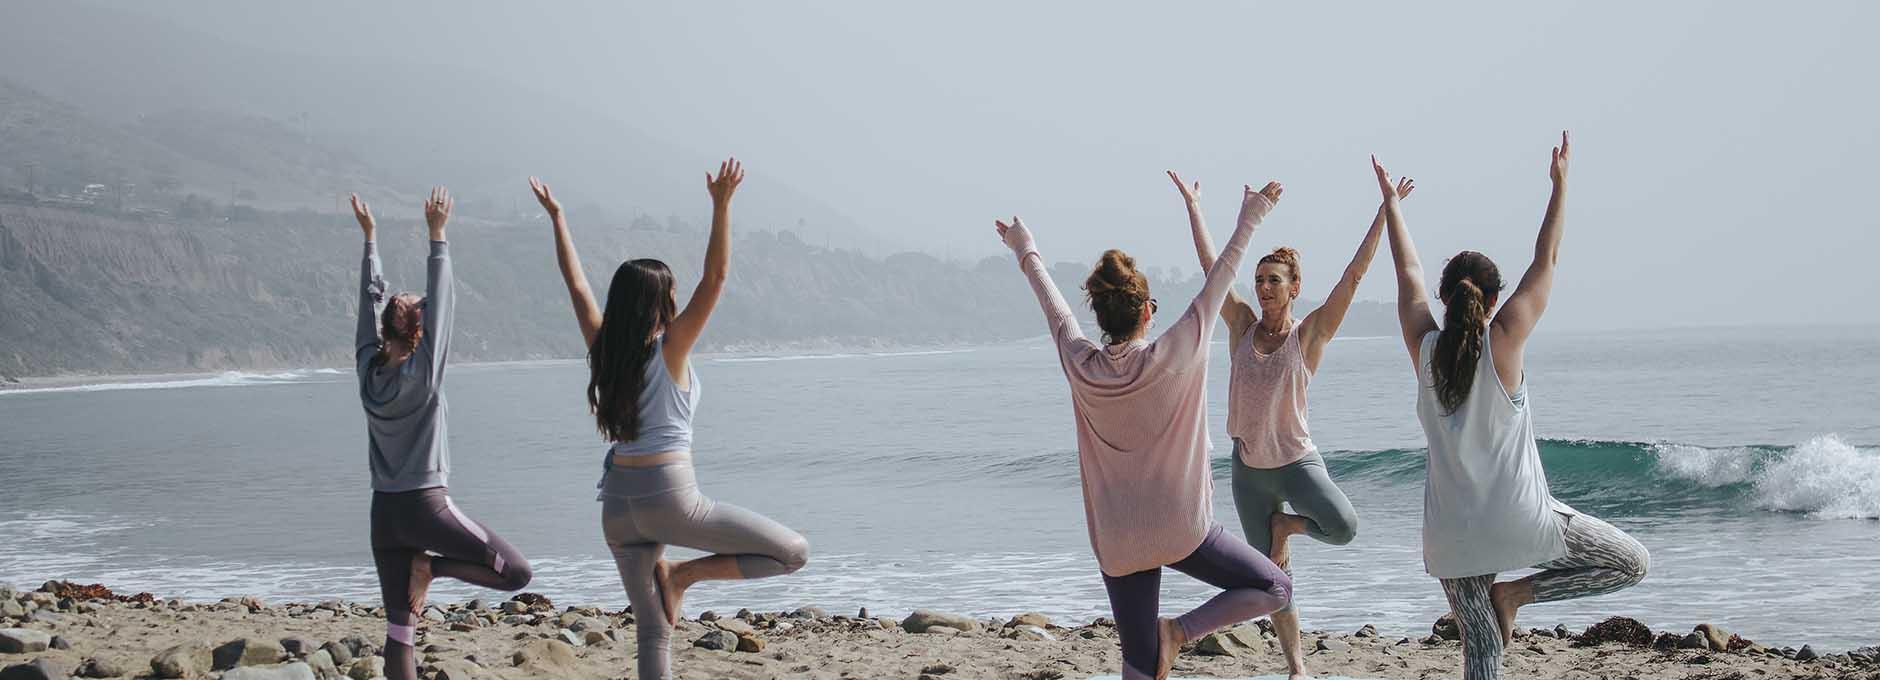 Women on beach doing Yoga